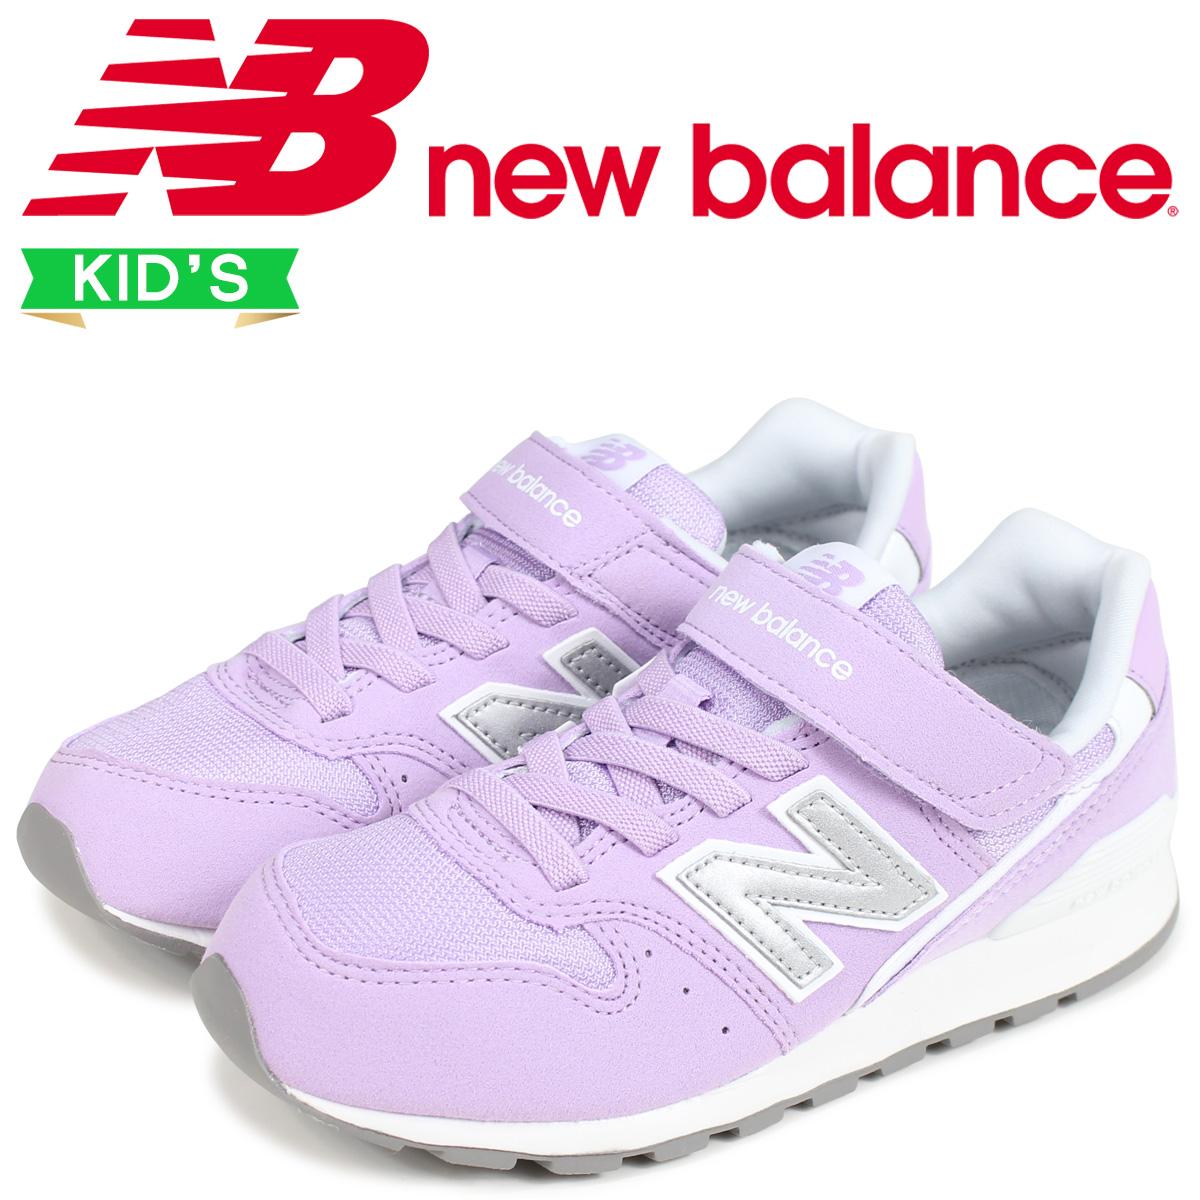 sports shoes 8b6f2 4010b new balance 996 kids New Balance sneakers KV996BRY D Wise purple